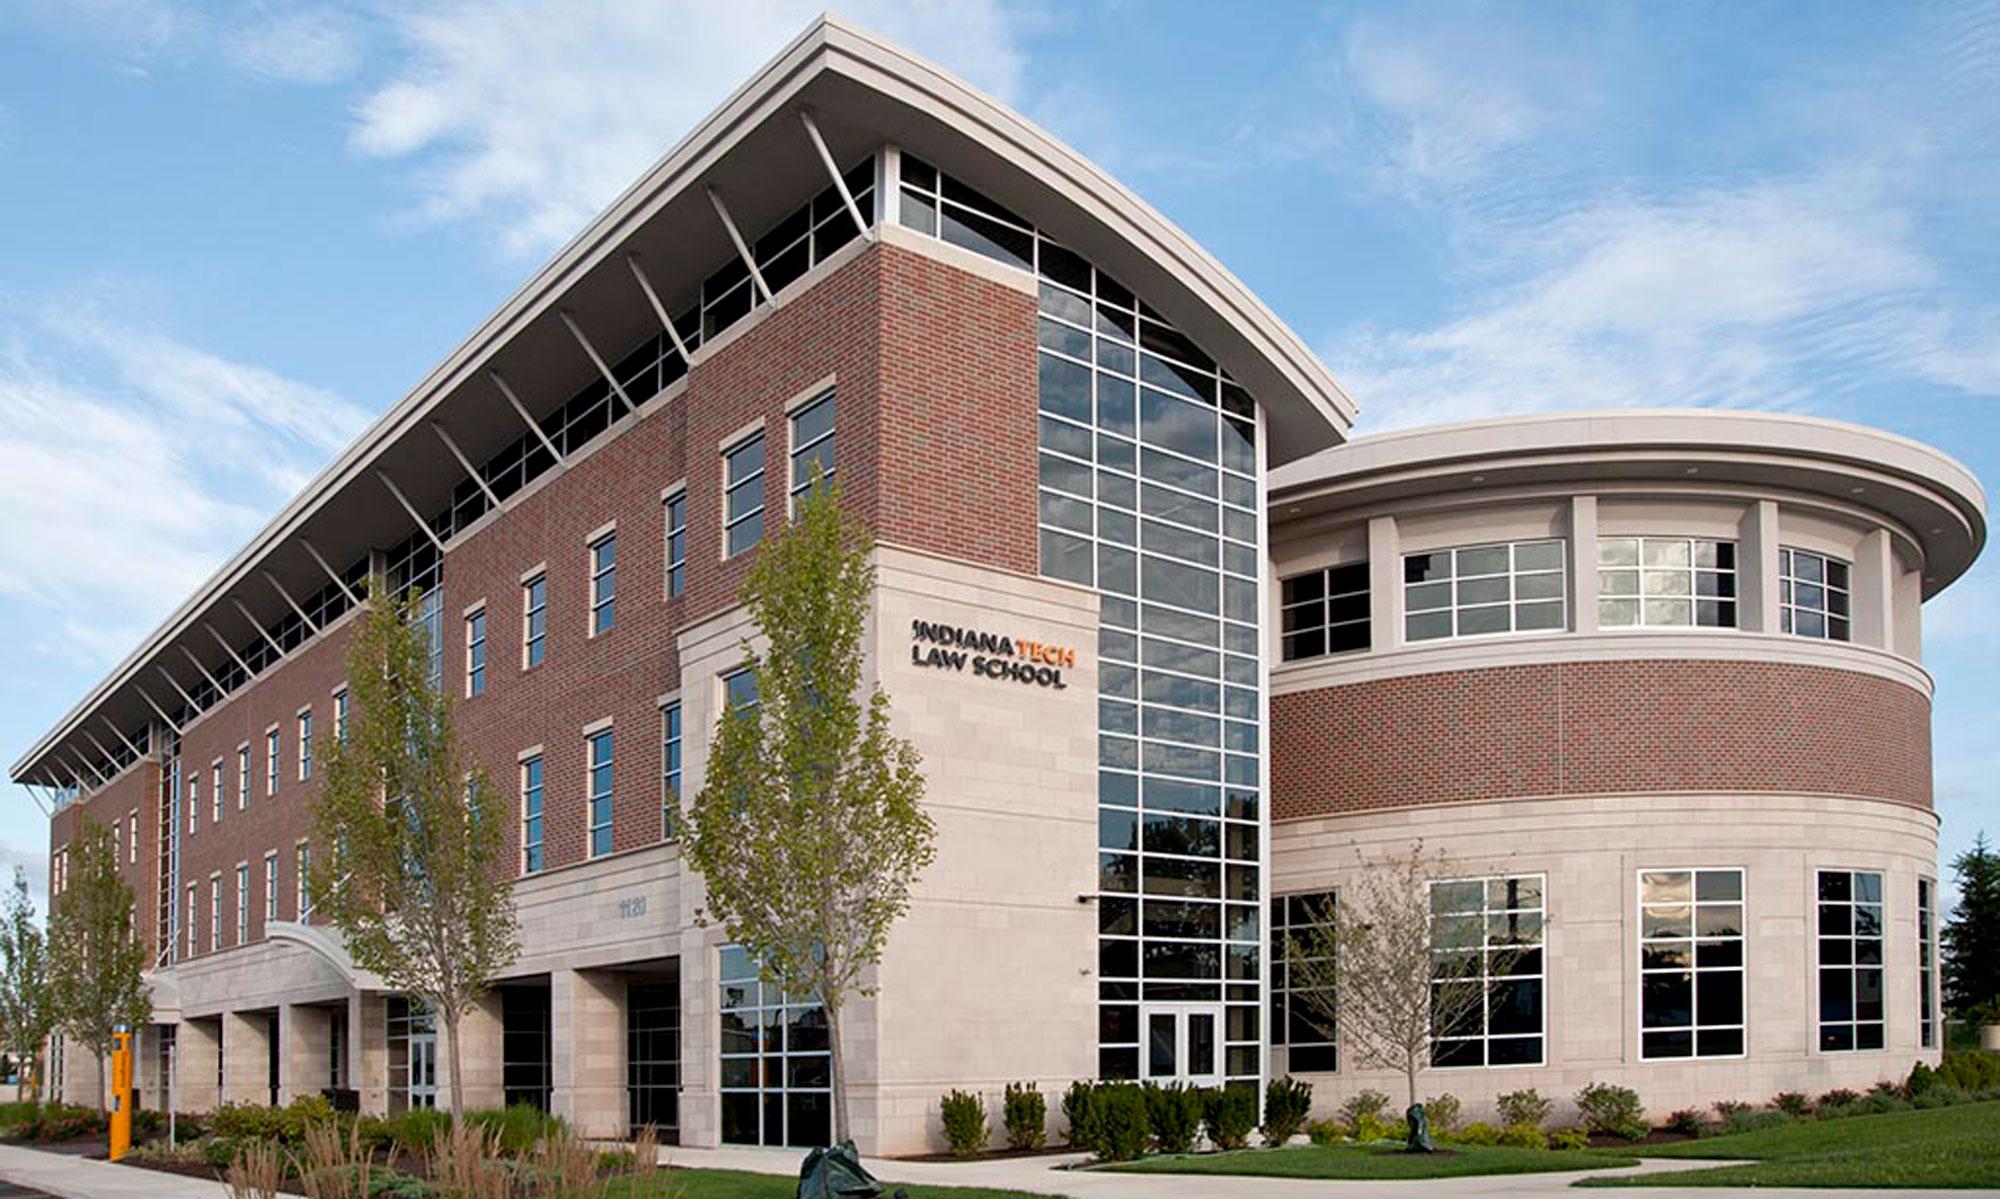 Indiana Tech Law School Exterior